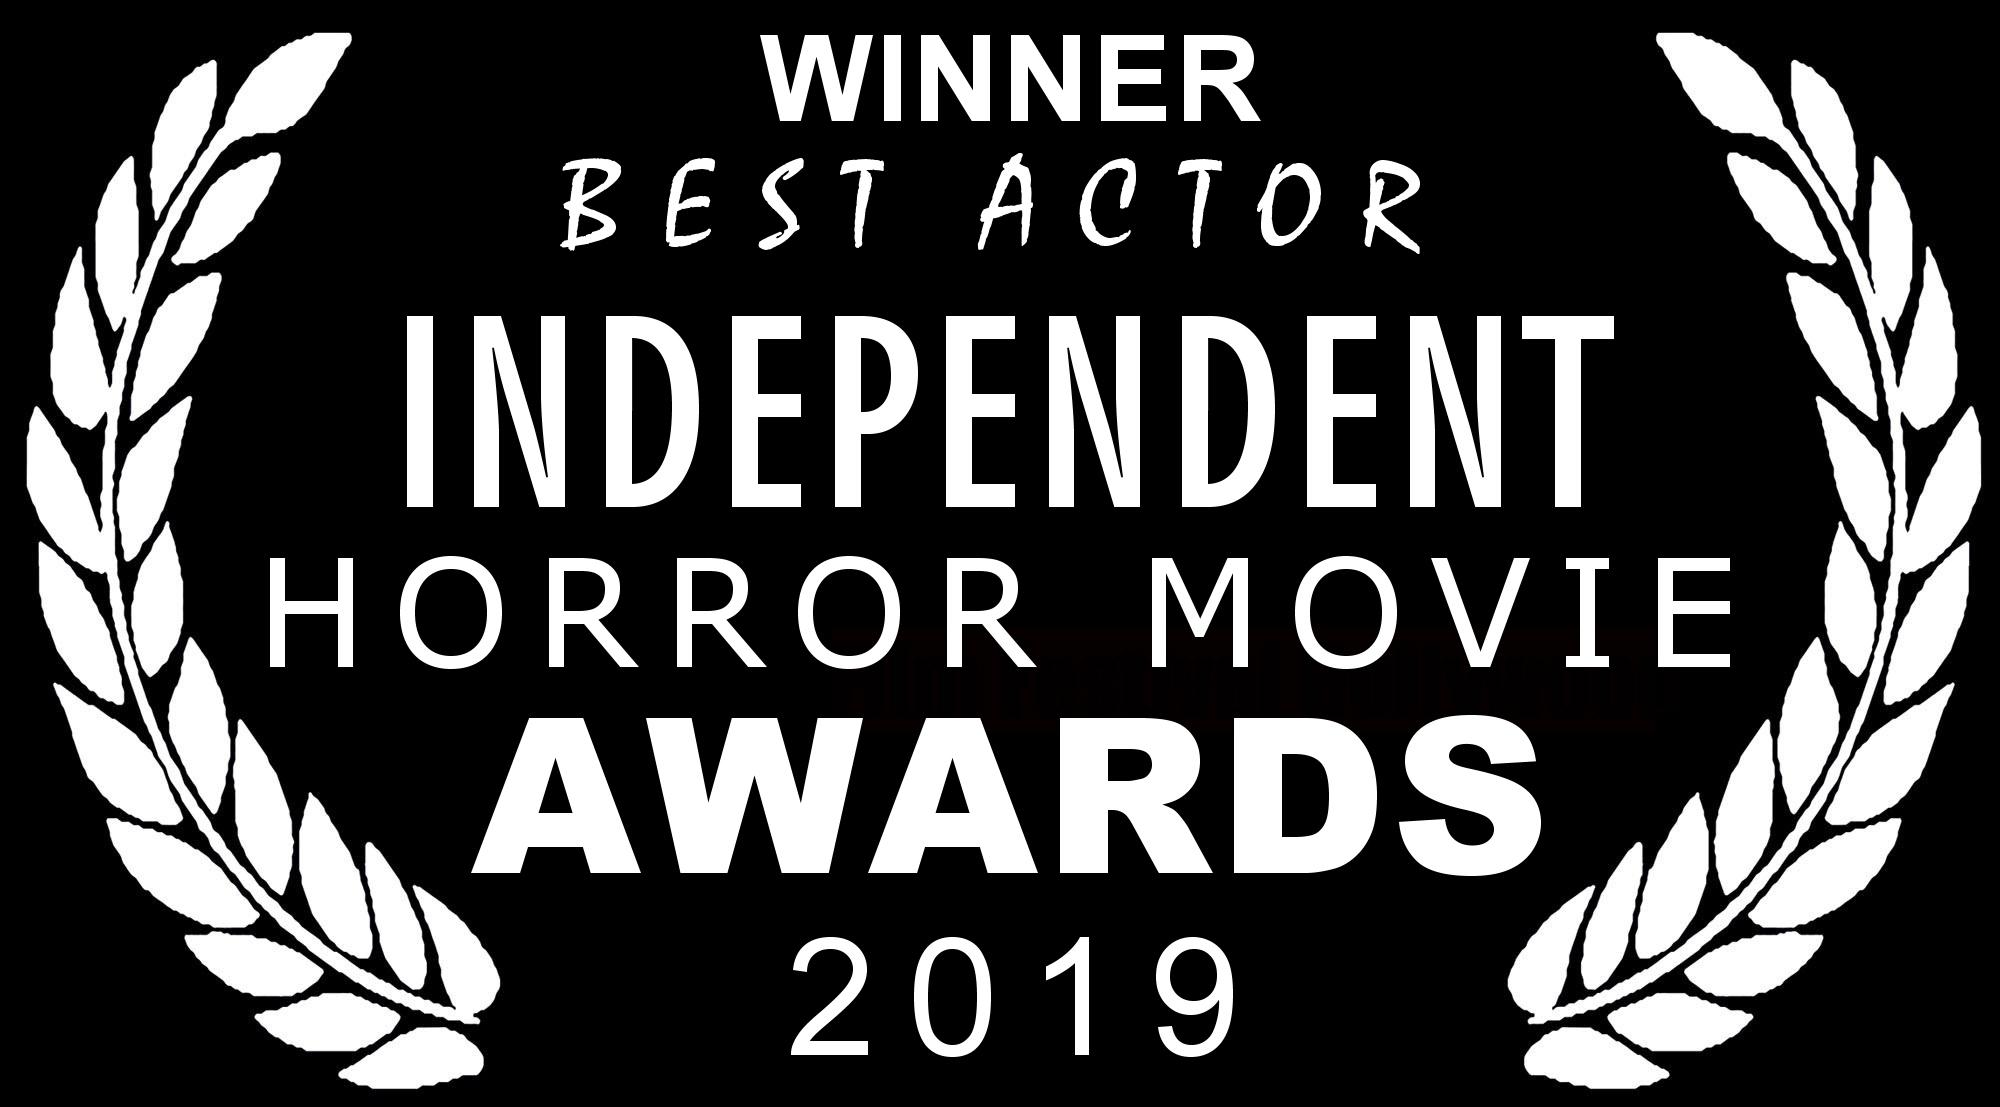 ihma-2019-winner-best-actor